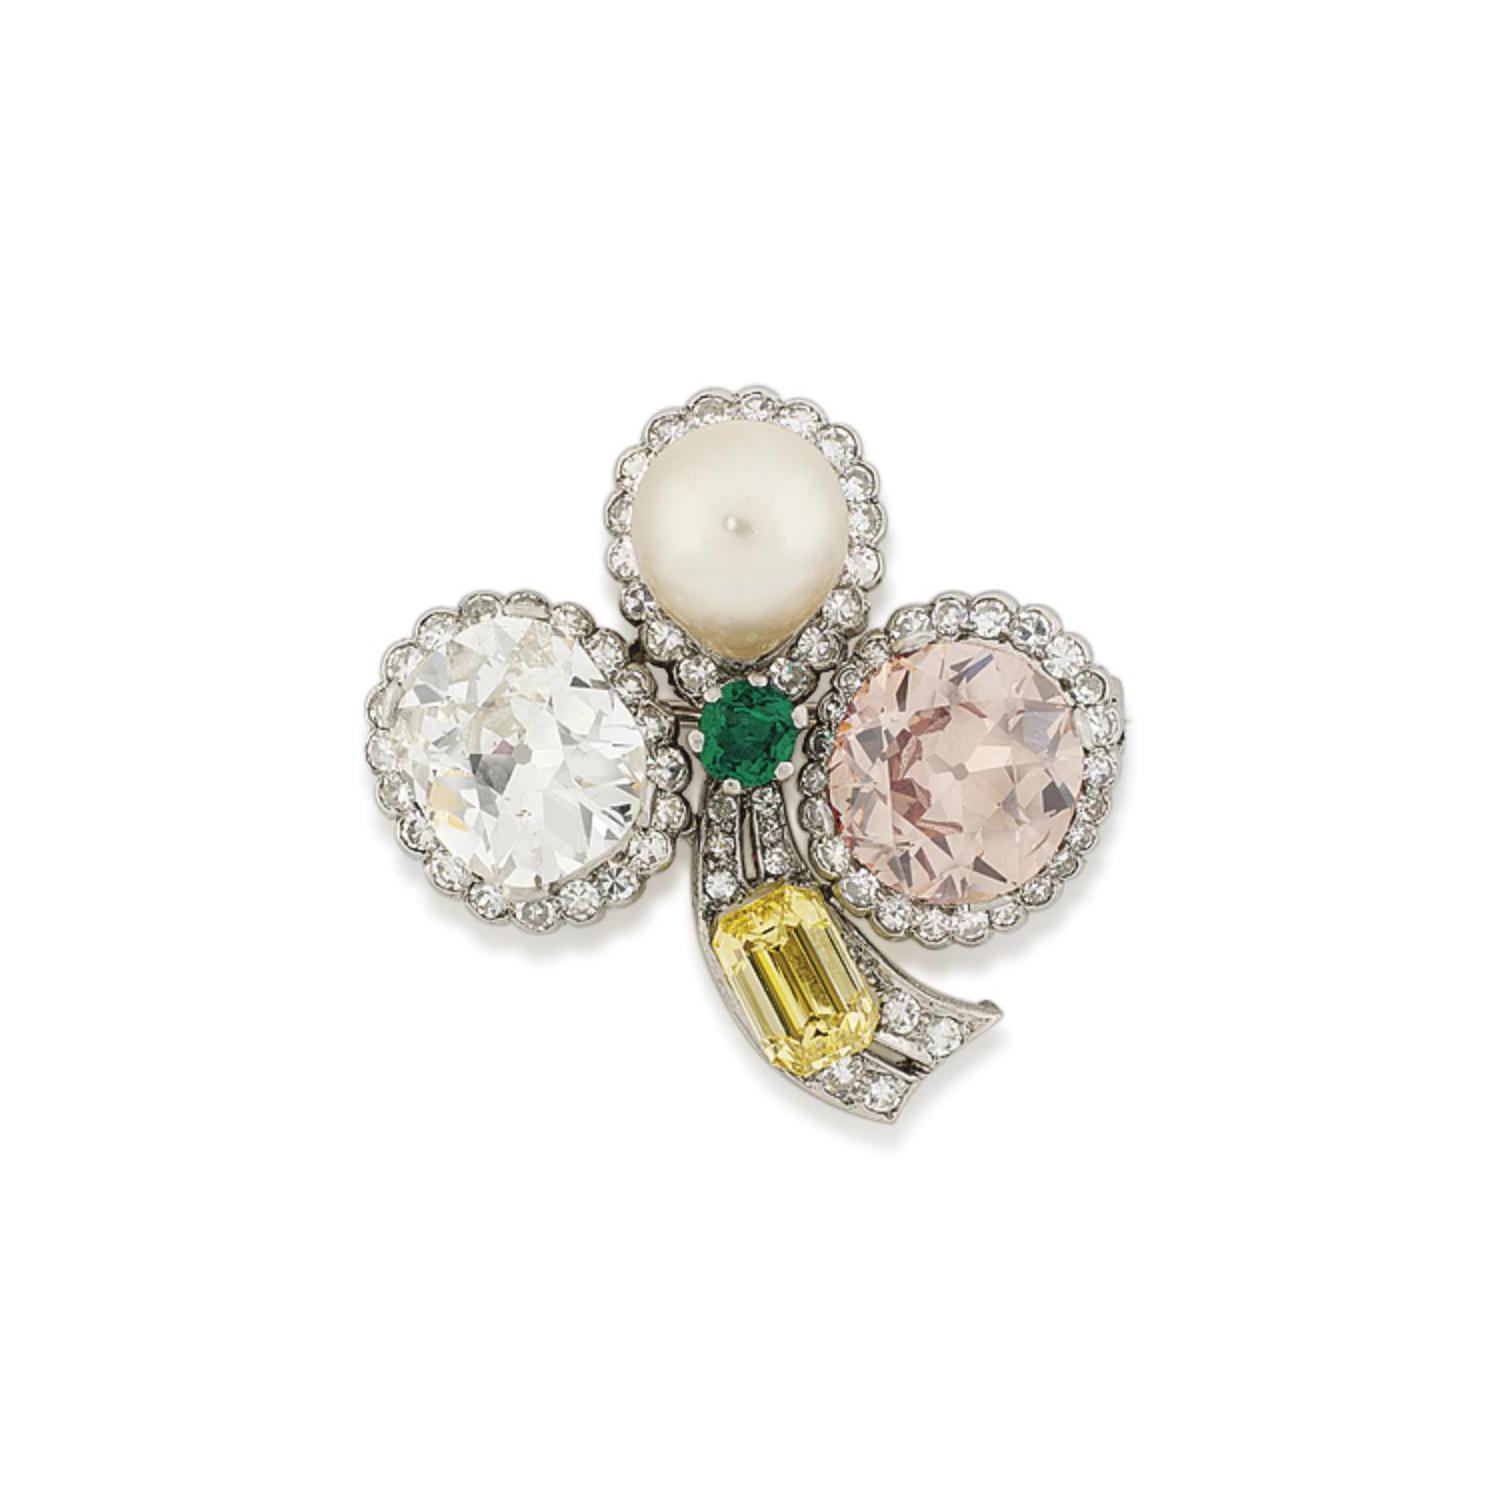 A COLOURED DIAMOND, PEARL, EMERALD AND DIAMOND CLOVER LEAF BROOCH